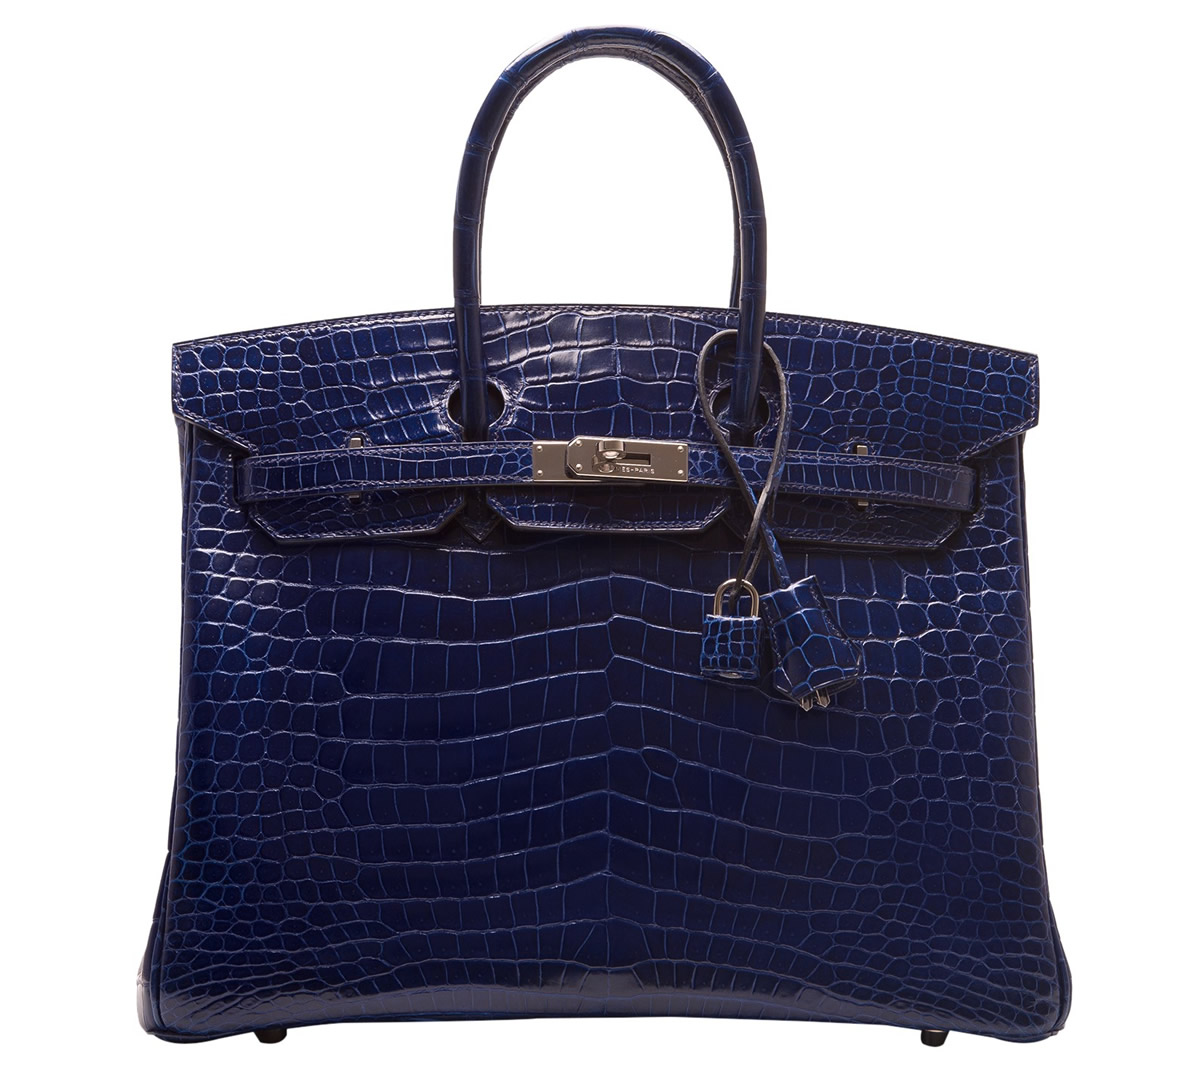 Hermes Blue Sapphire Shiny Porosus Crocodile Birkin 35cm Portero